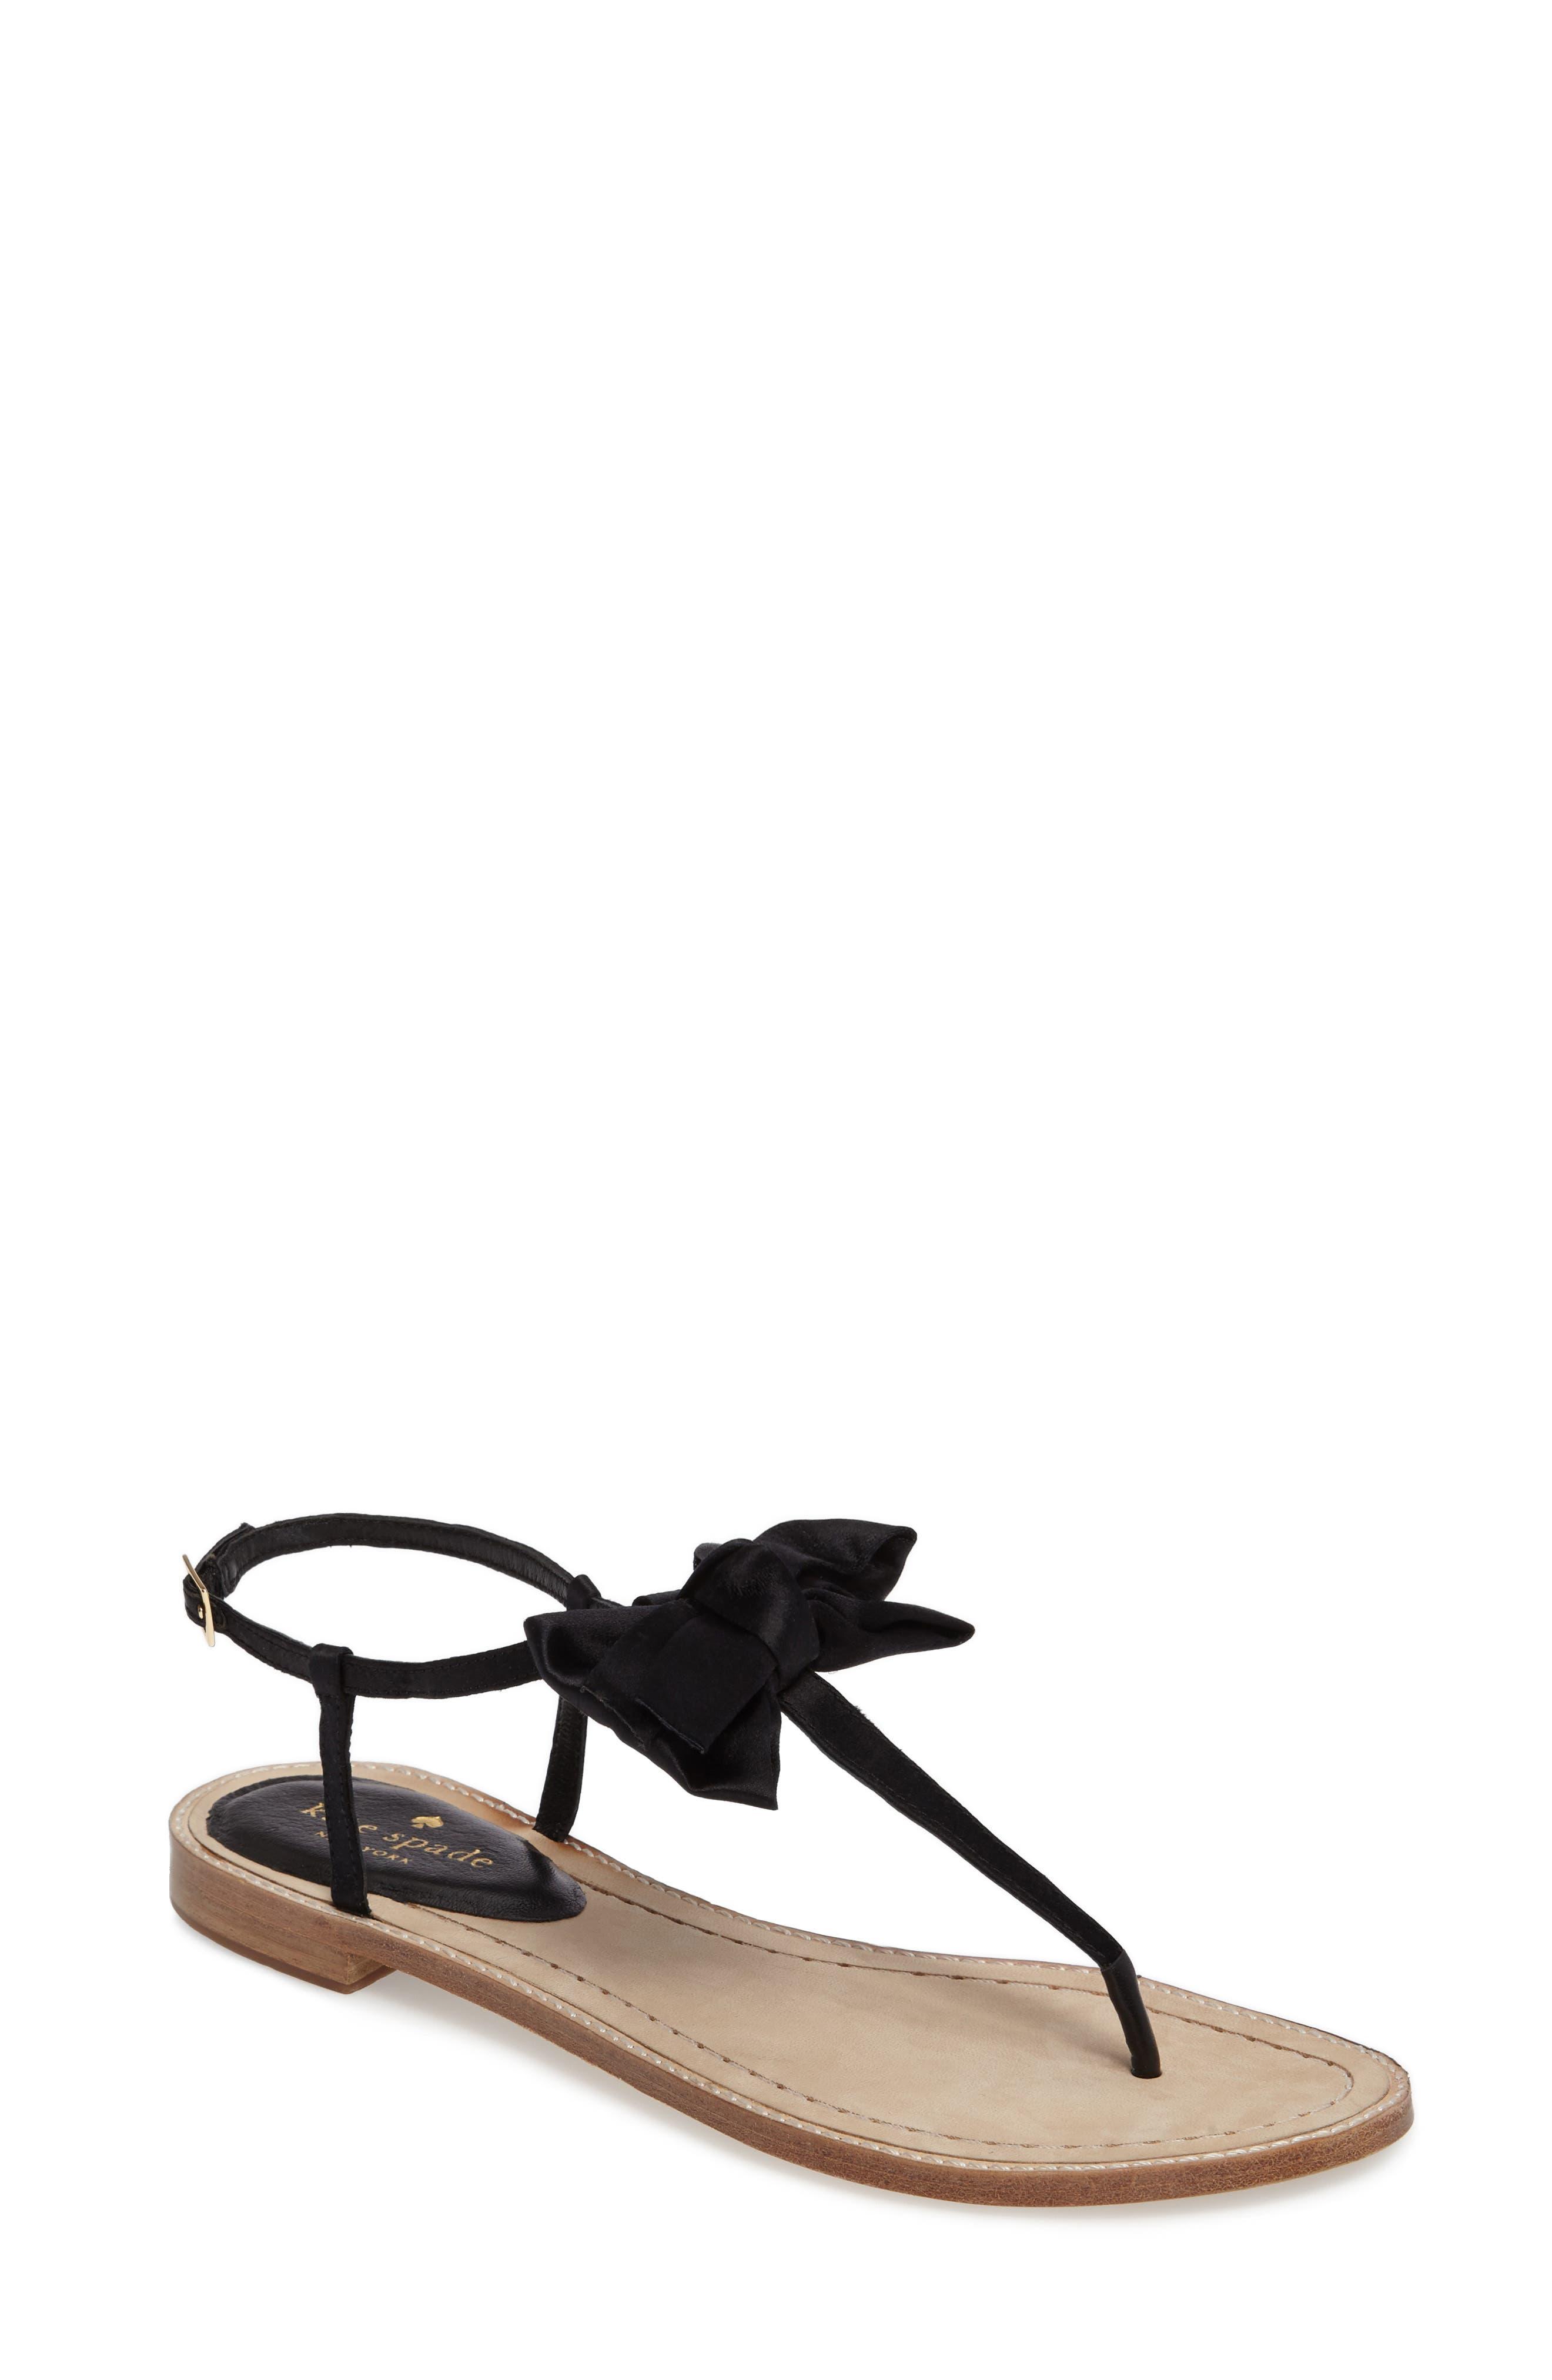 Main Image - kate spade new york serrano bow sandal (Women)